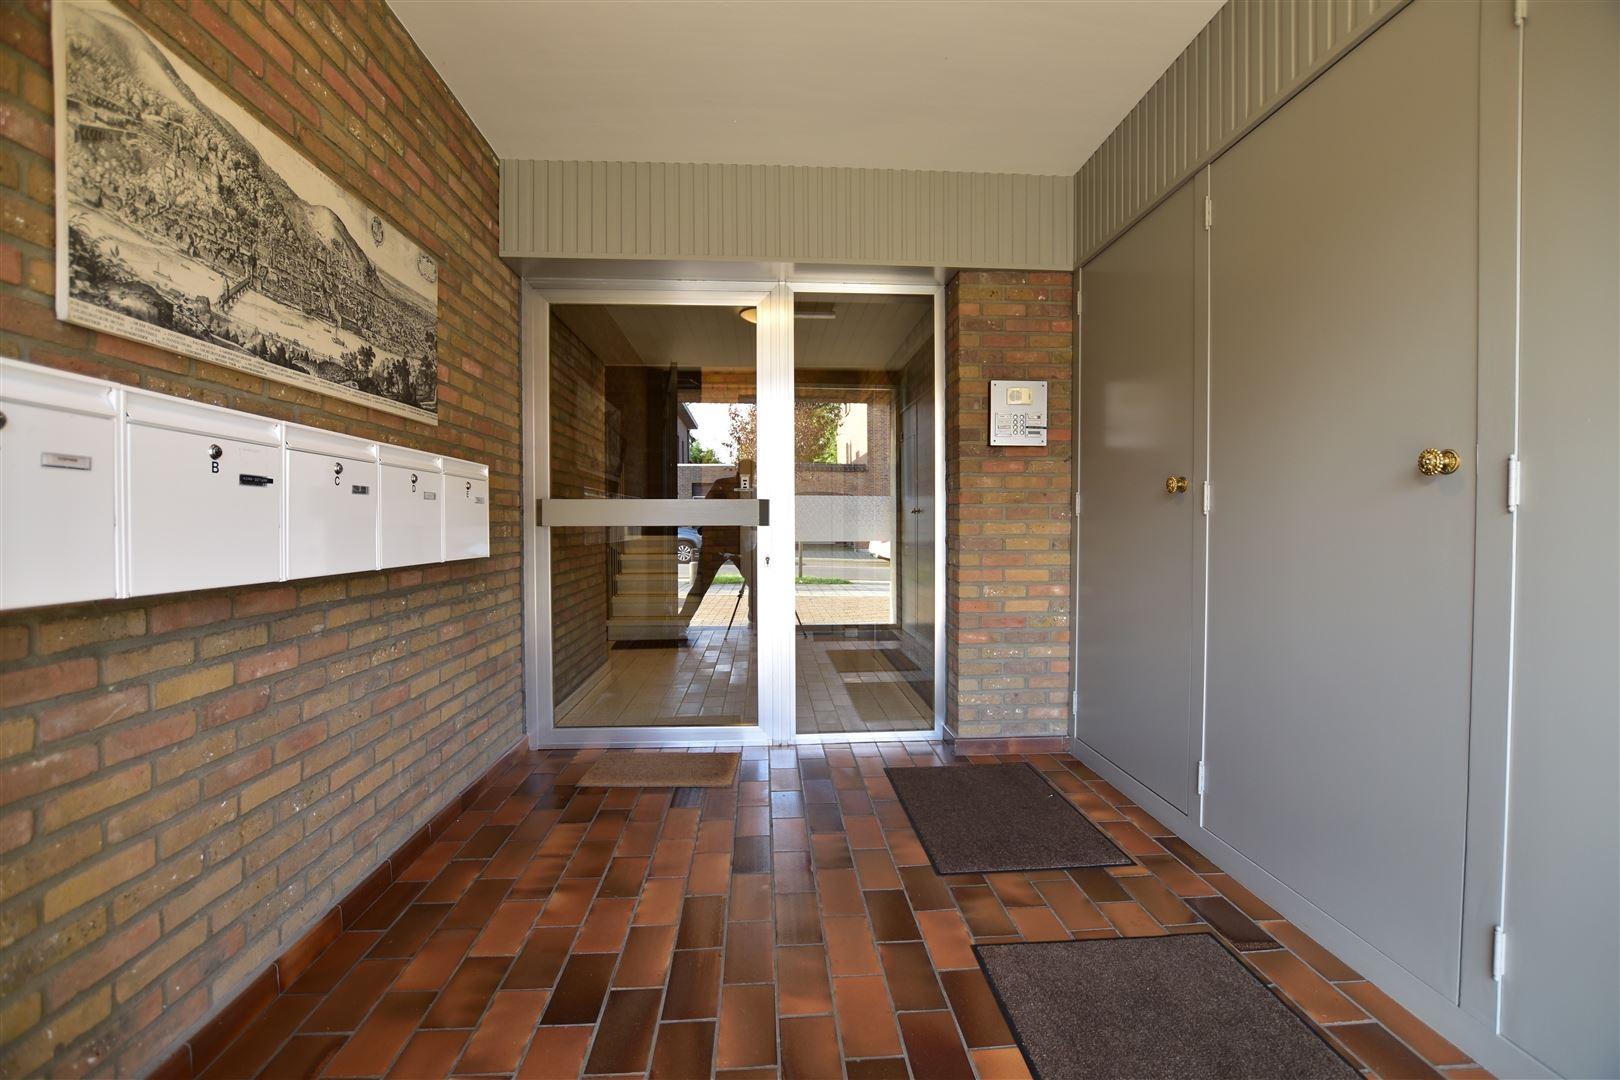 Foto 11 : Appartement te 9140 TEMSE (België) - Prijs € 299.000